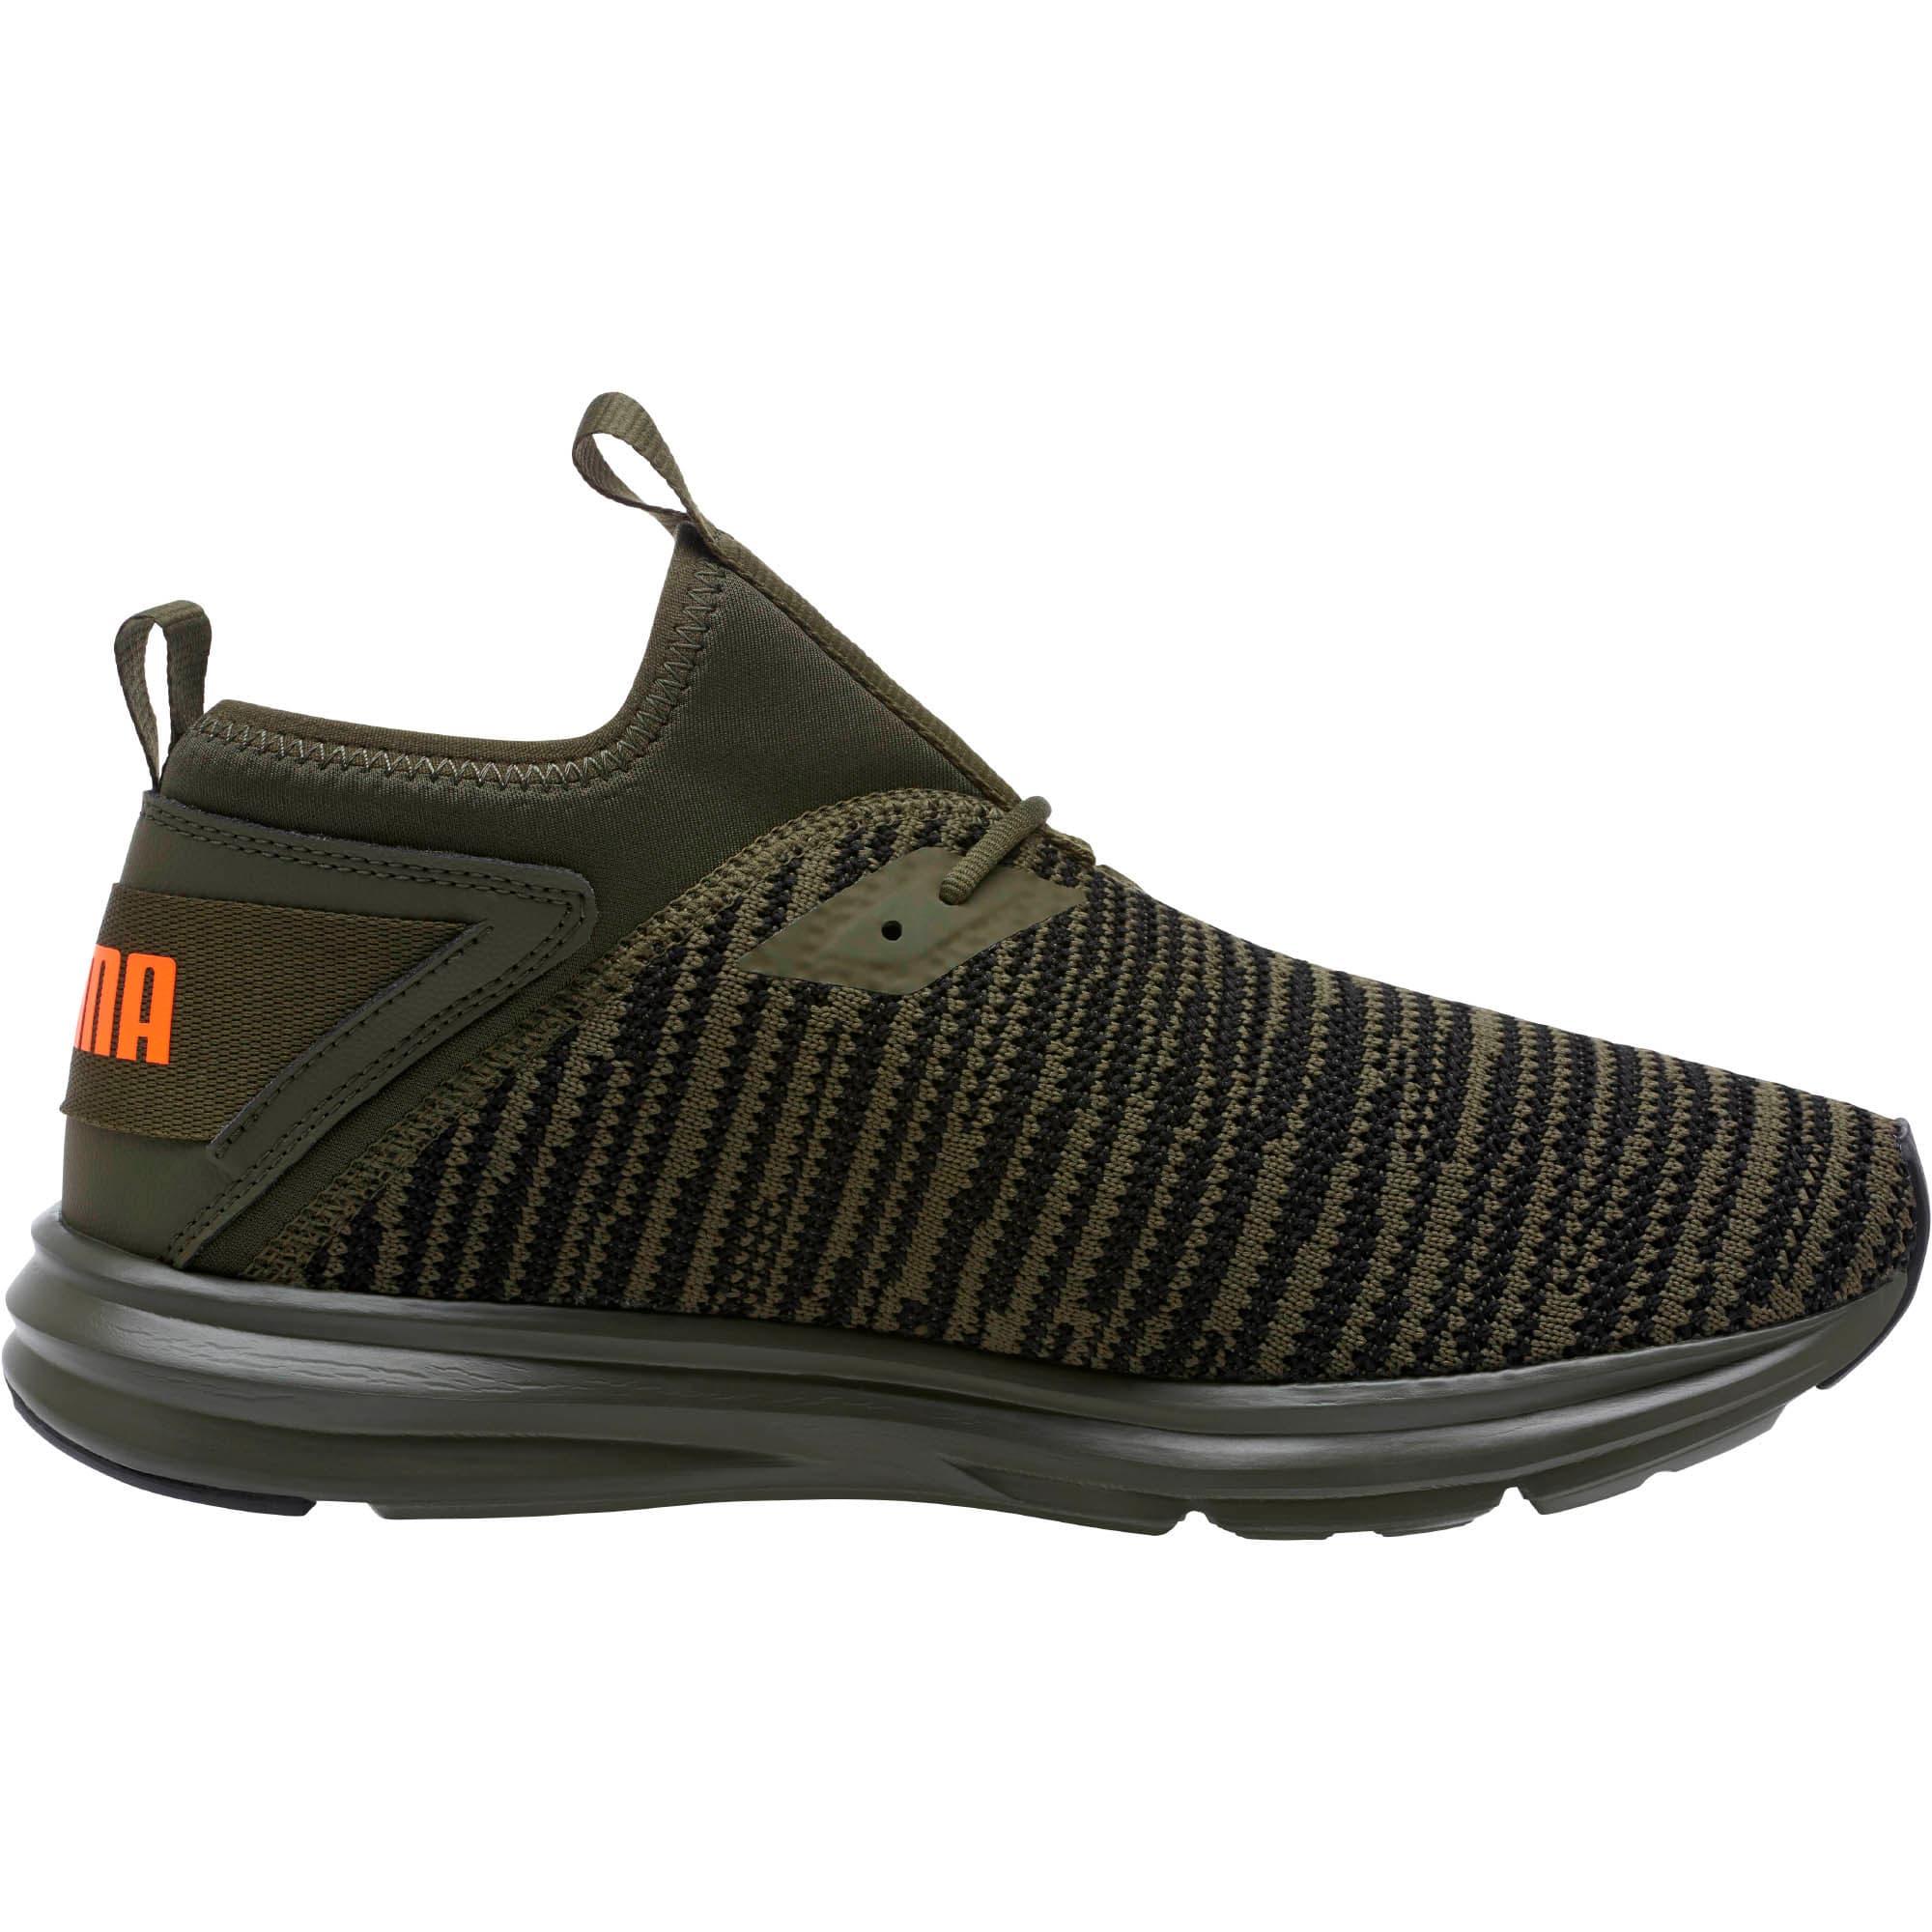 Thumbnail 3 of Enzo Peak Men's Sneakers, Forest Night-Black-Orange, medium